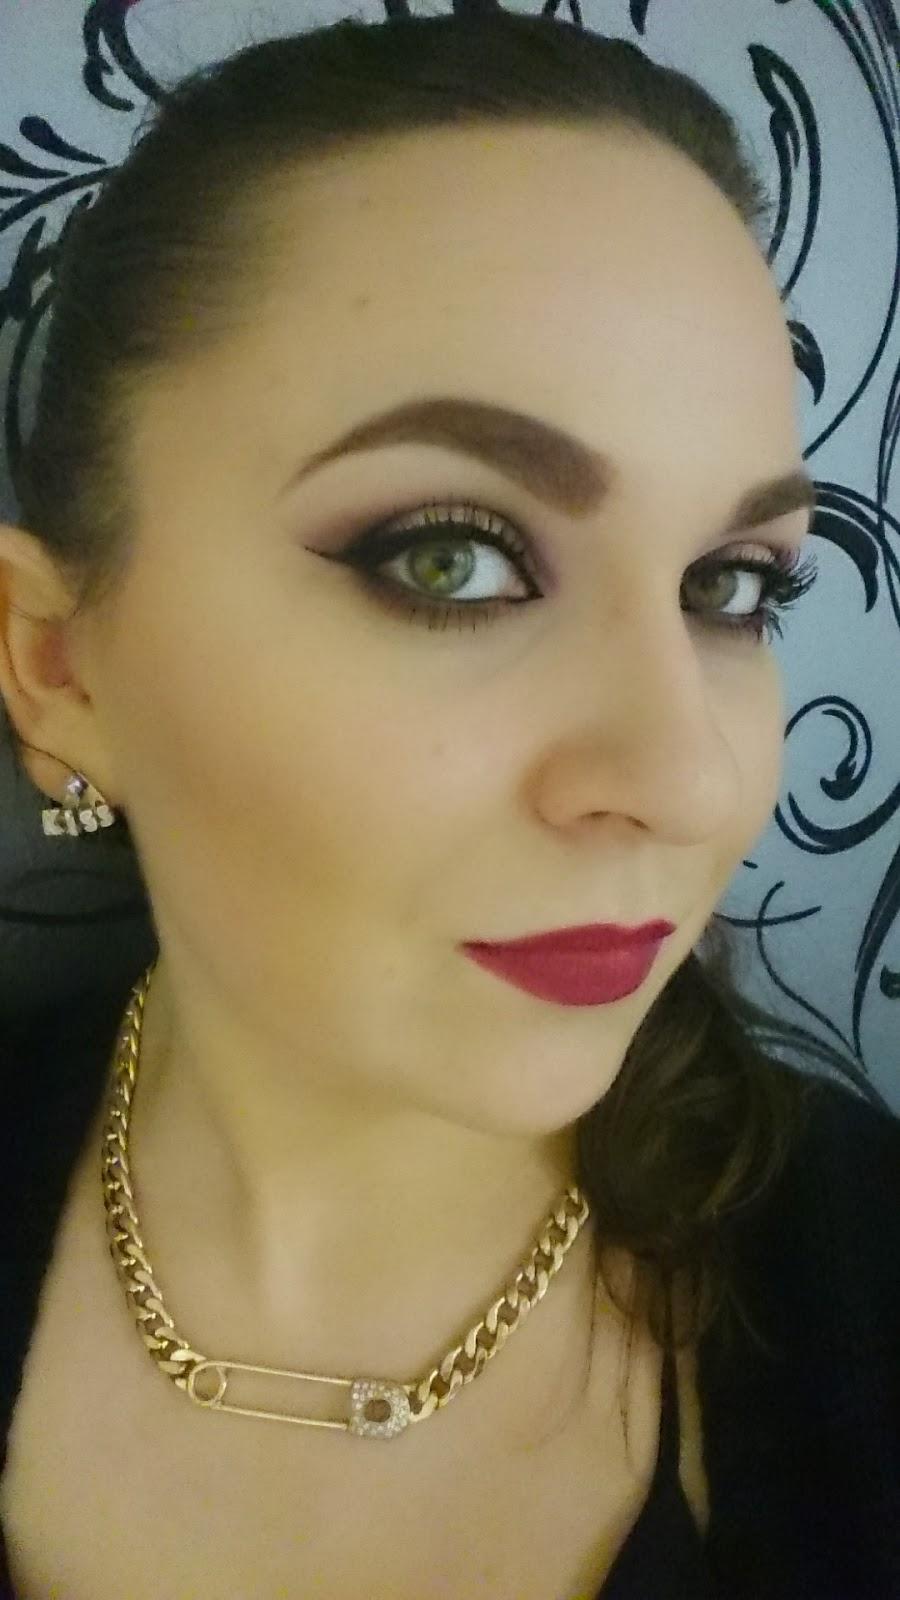 Jual Murah Wet N Wild Megalast Lip Color Pink Suga E900b Terbaru Tony Perotti Sandals Evangelos Brown Cokelat Tua 39 Zuzana Sekely Beauty Guru January 2015 Was